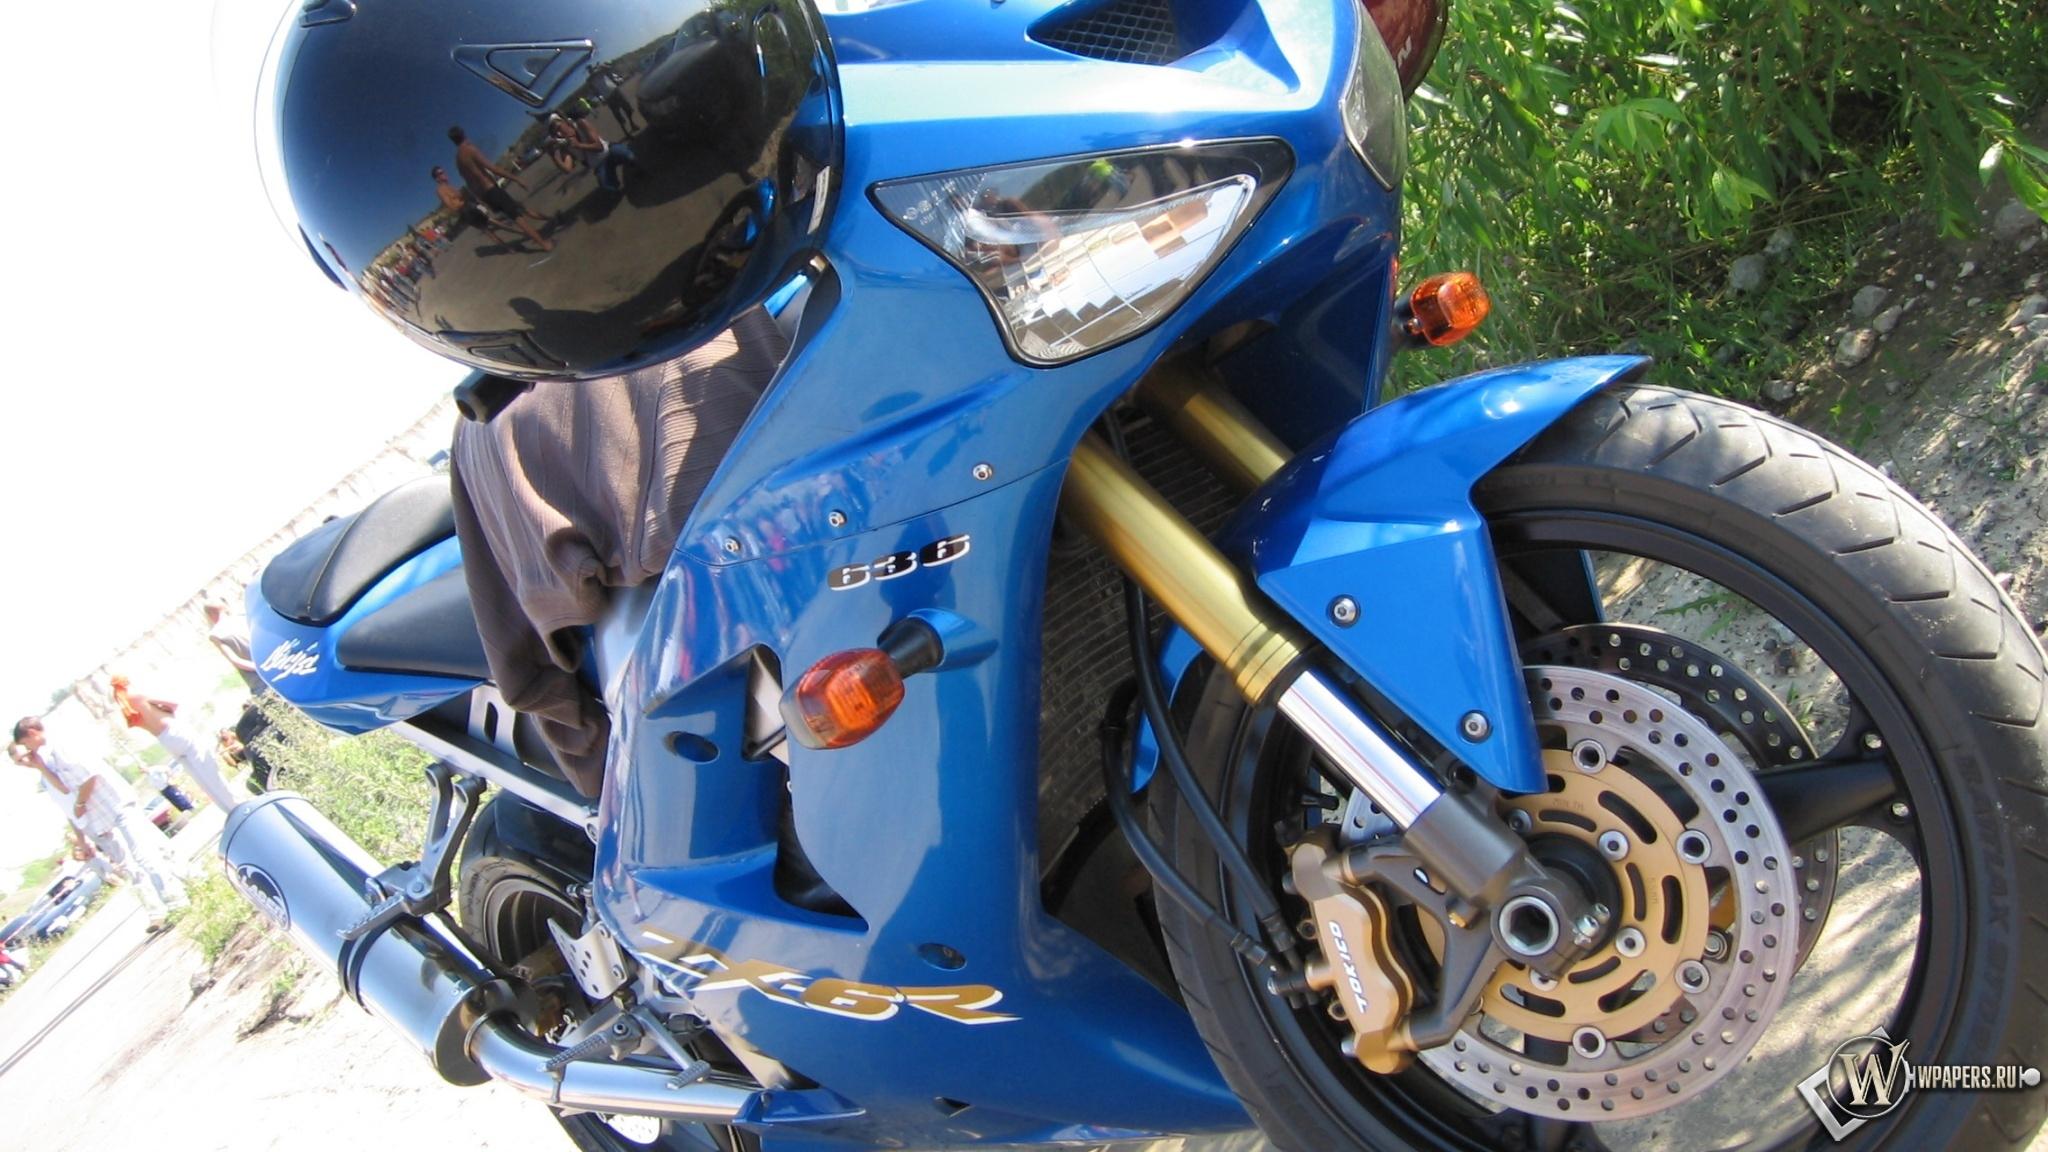 Kawasaki Ninja 2048x1152